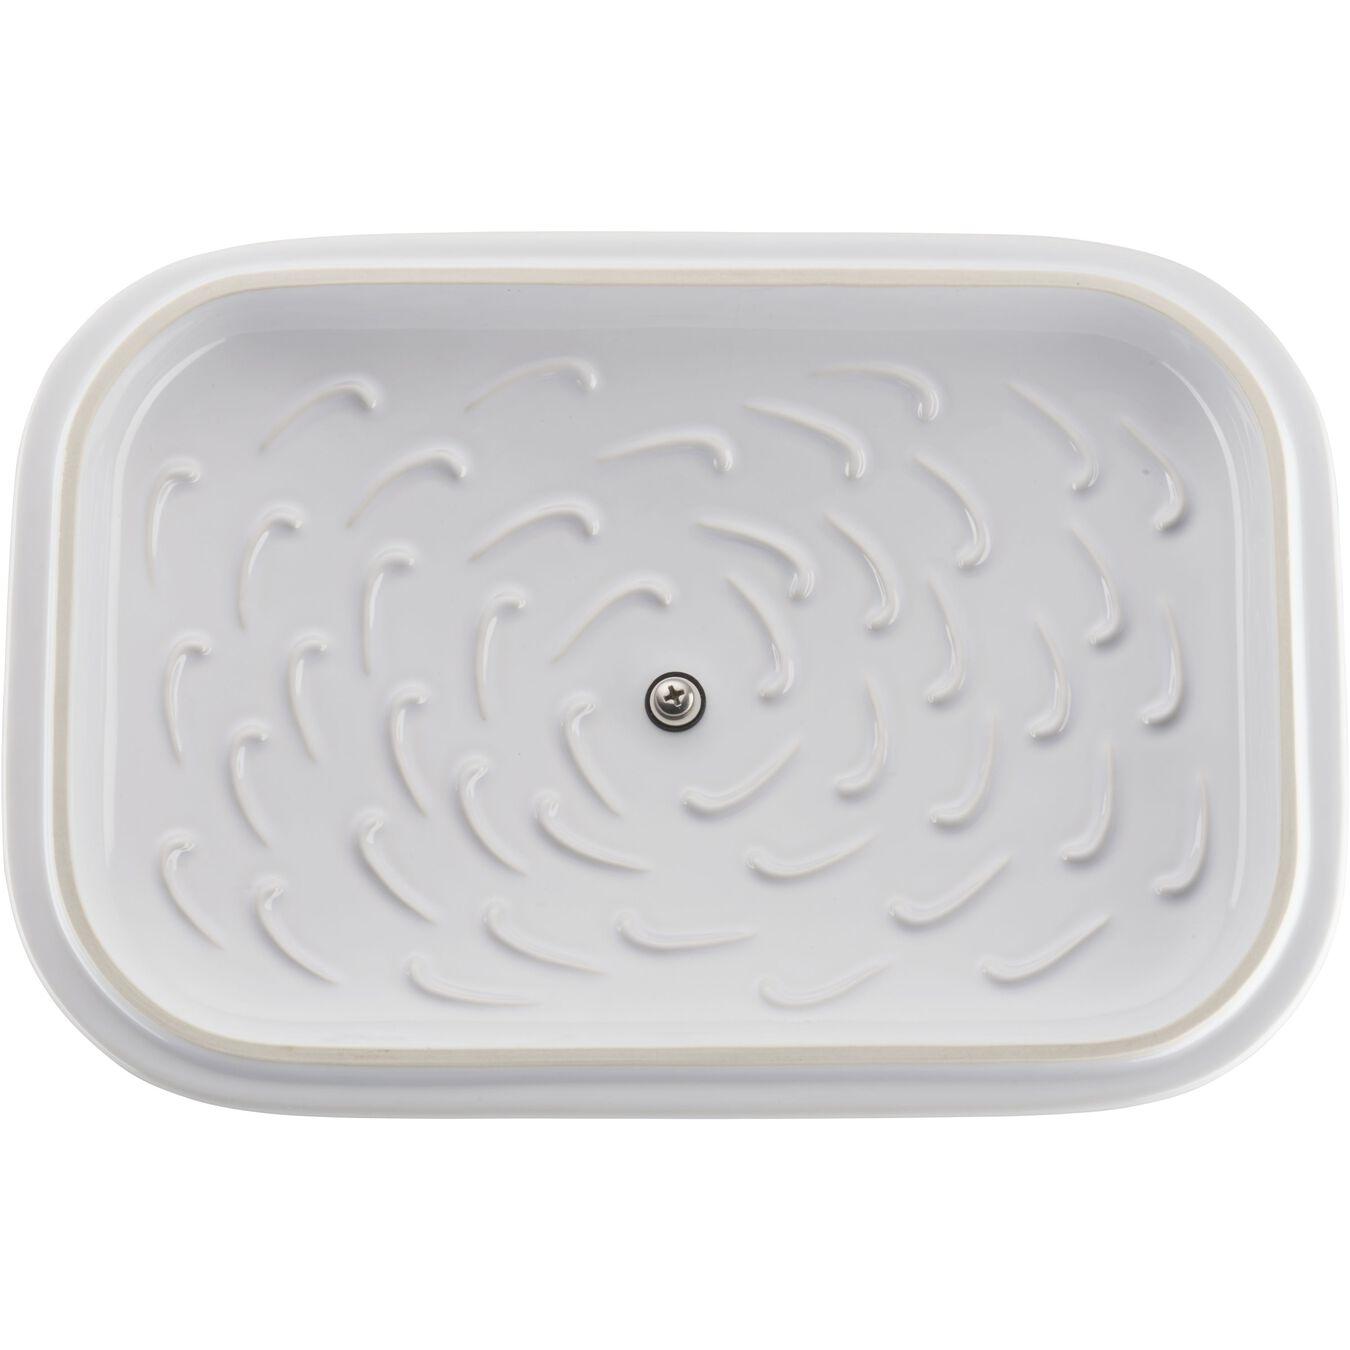 rectangular, Special shape bakeware, white,,large 2